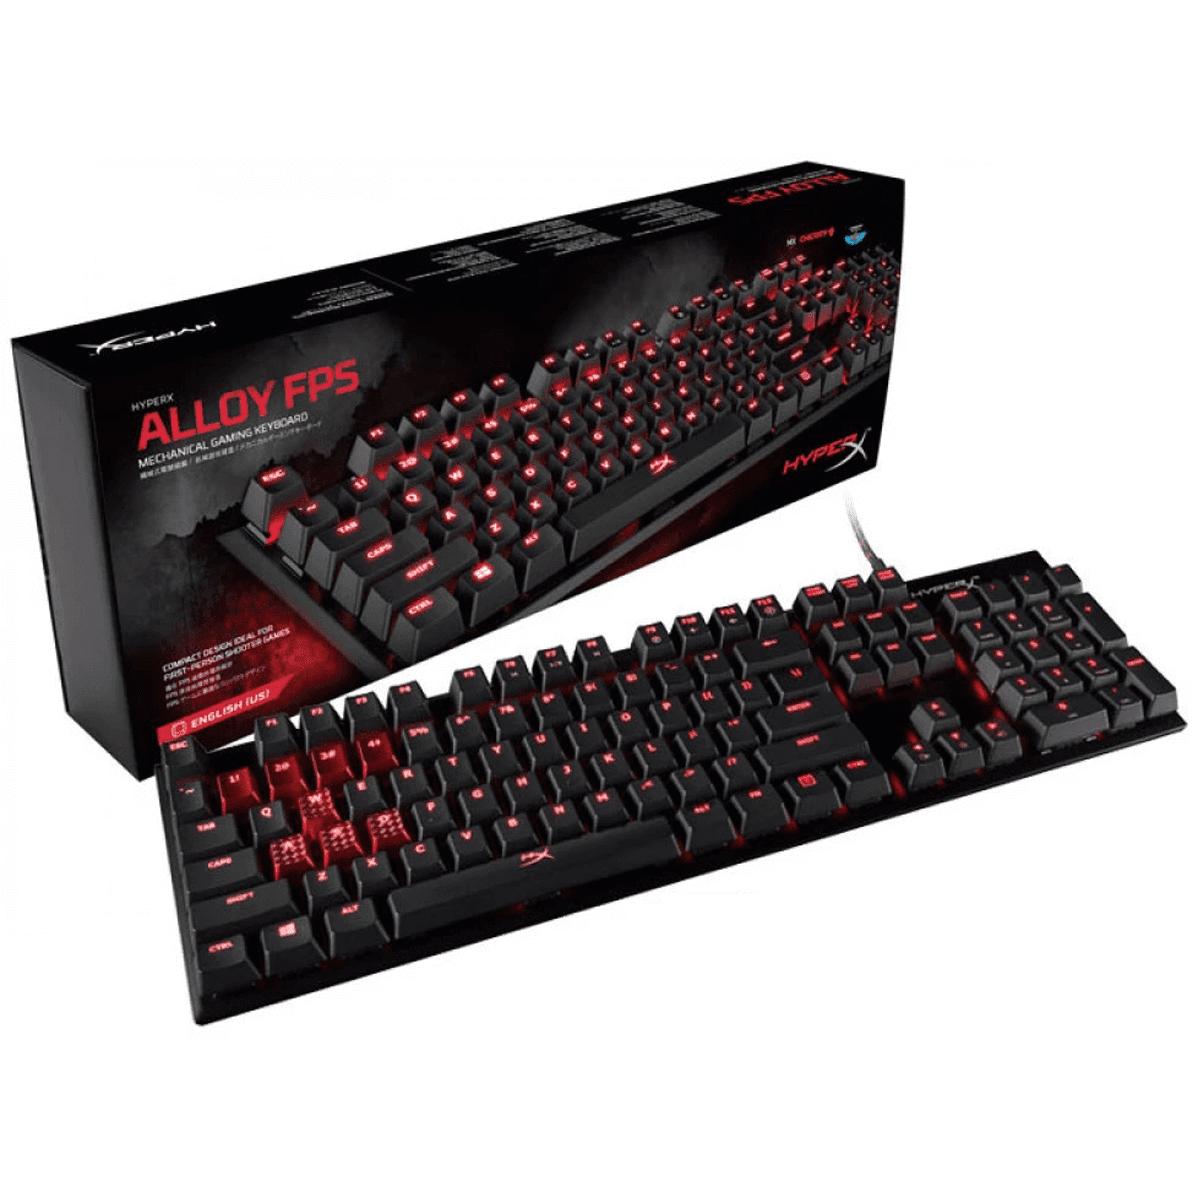 Teclado Gamer HyperX Alloy FPS Mecânico Cherry MX Blue US - HX-KB1BL1-NA/A4